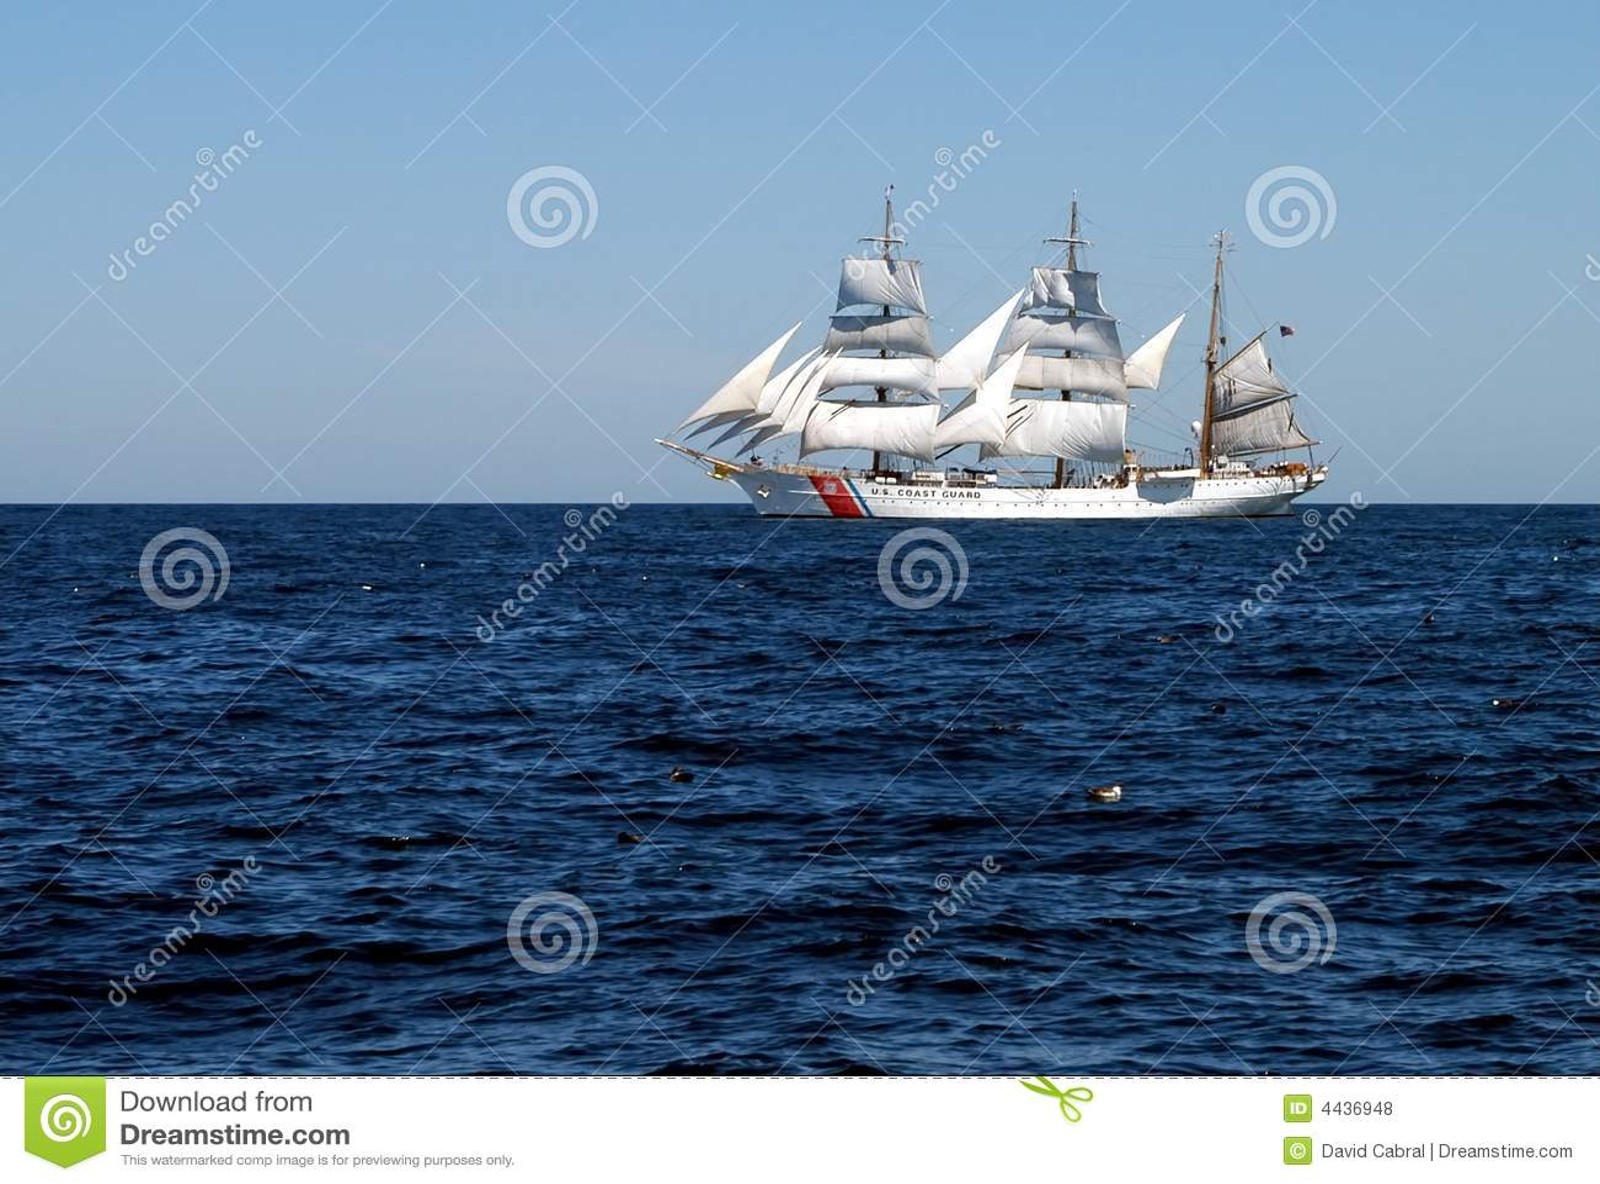 Masted schooner 3